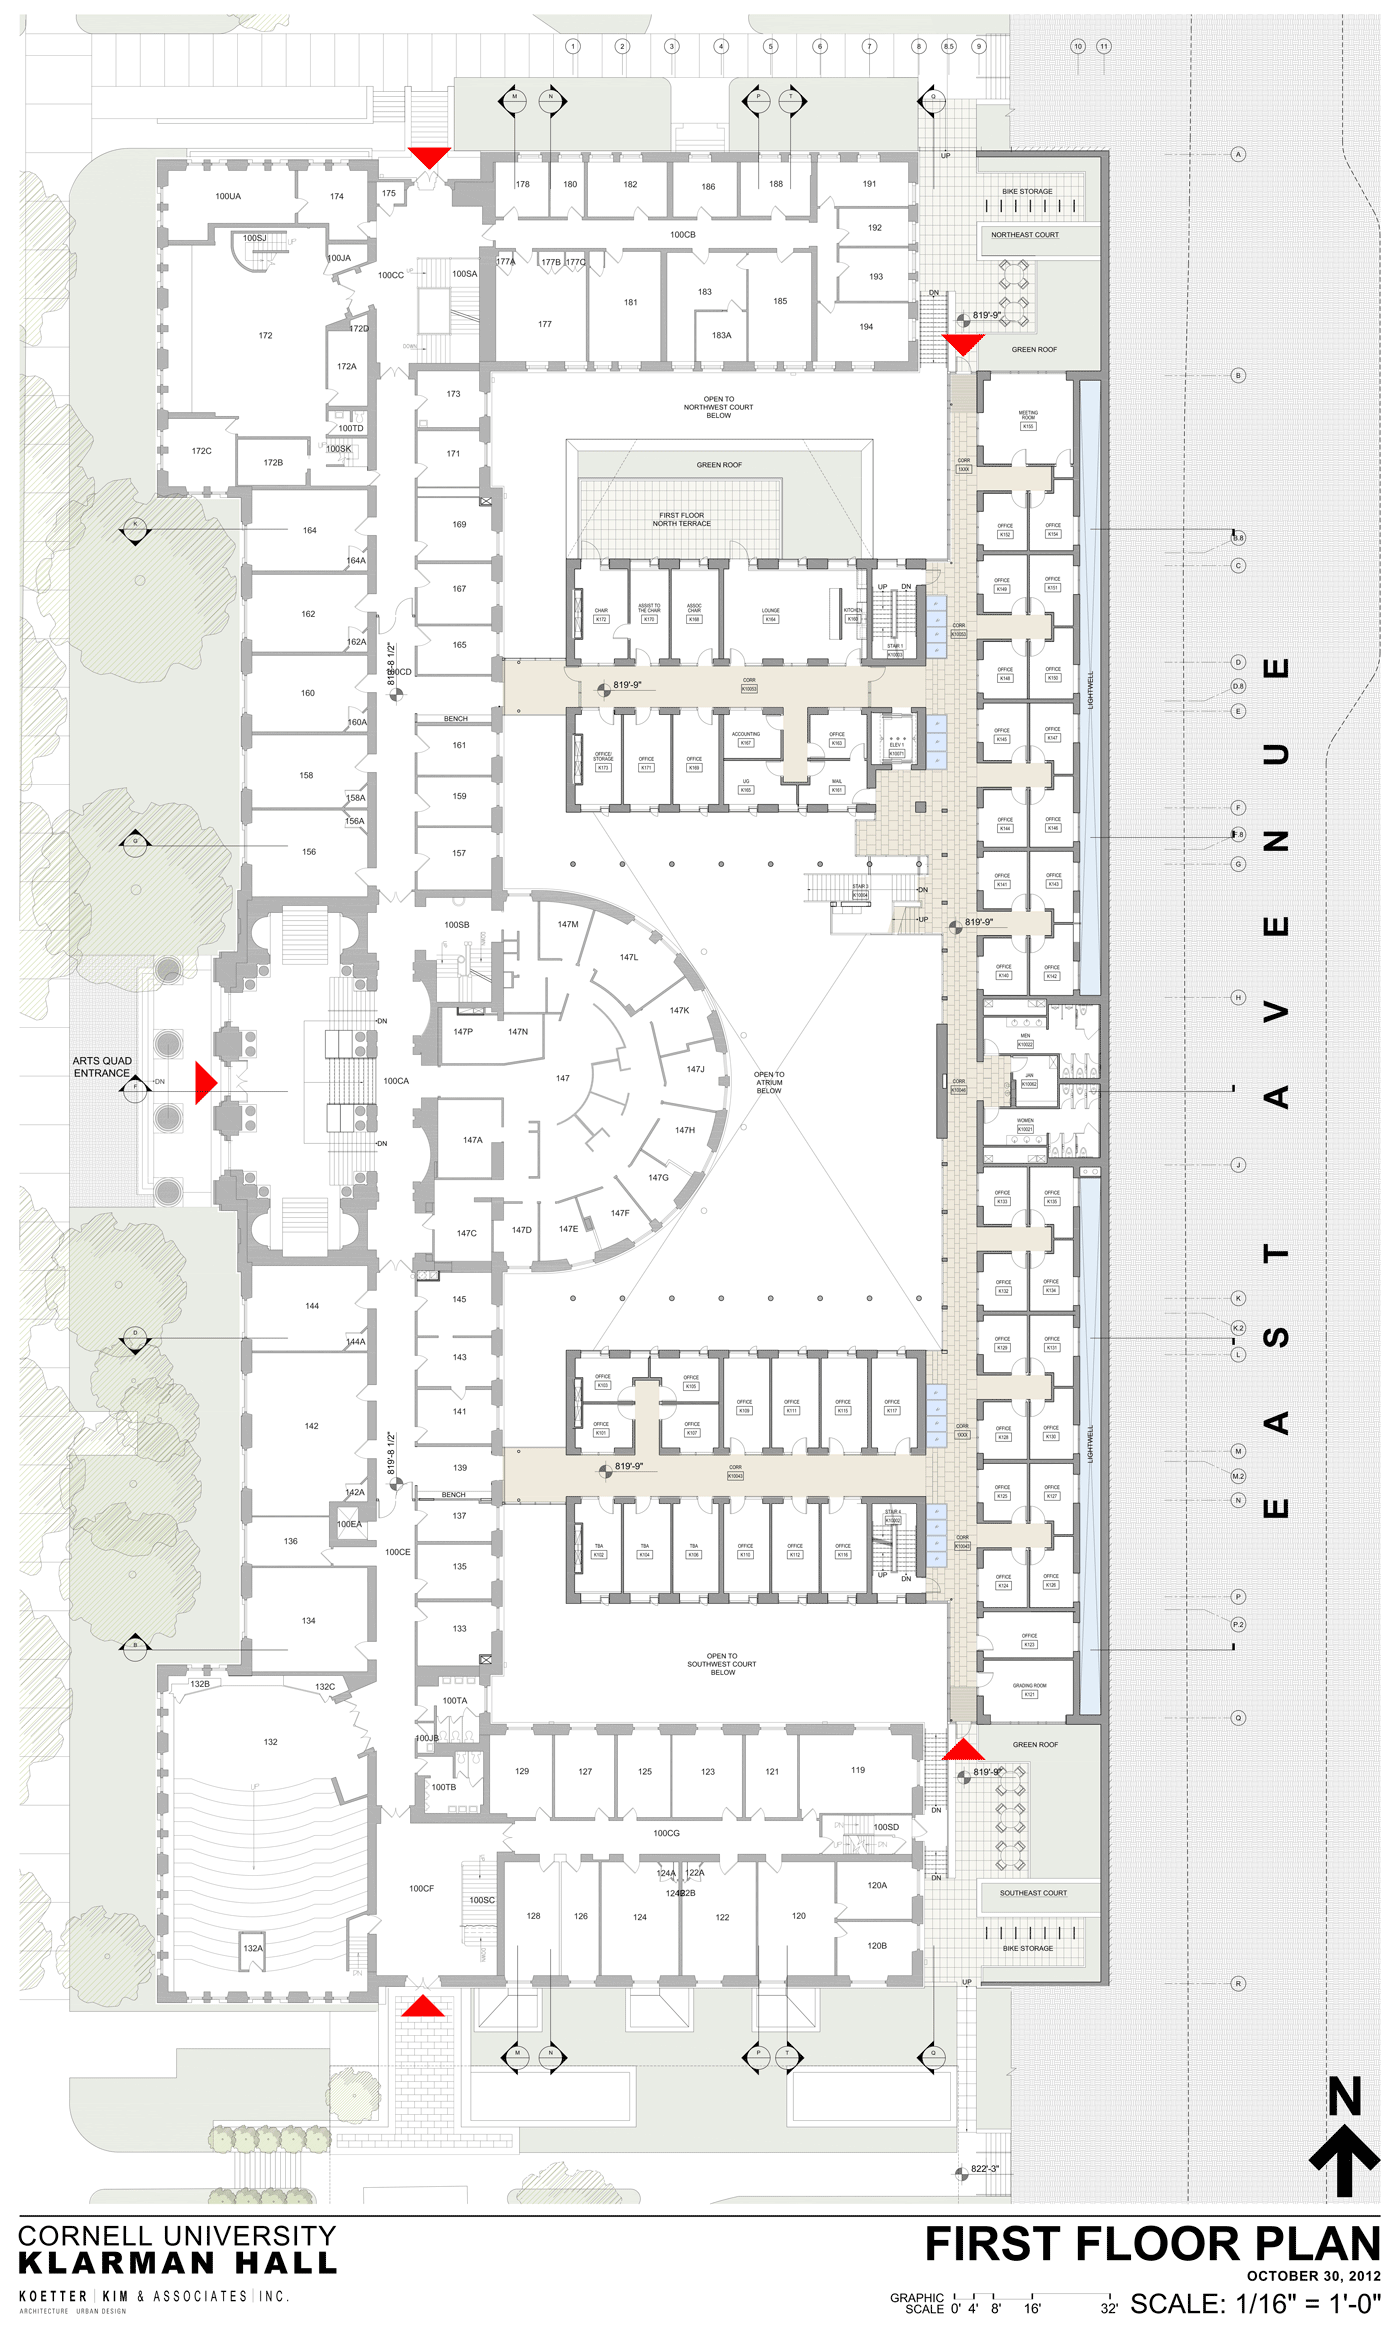 klarman-hall-floor-plans-2-re